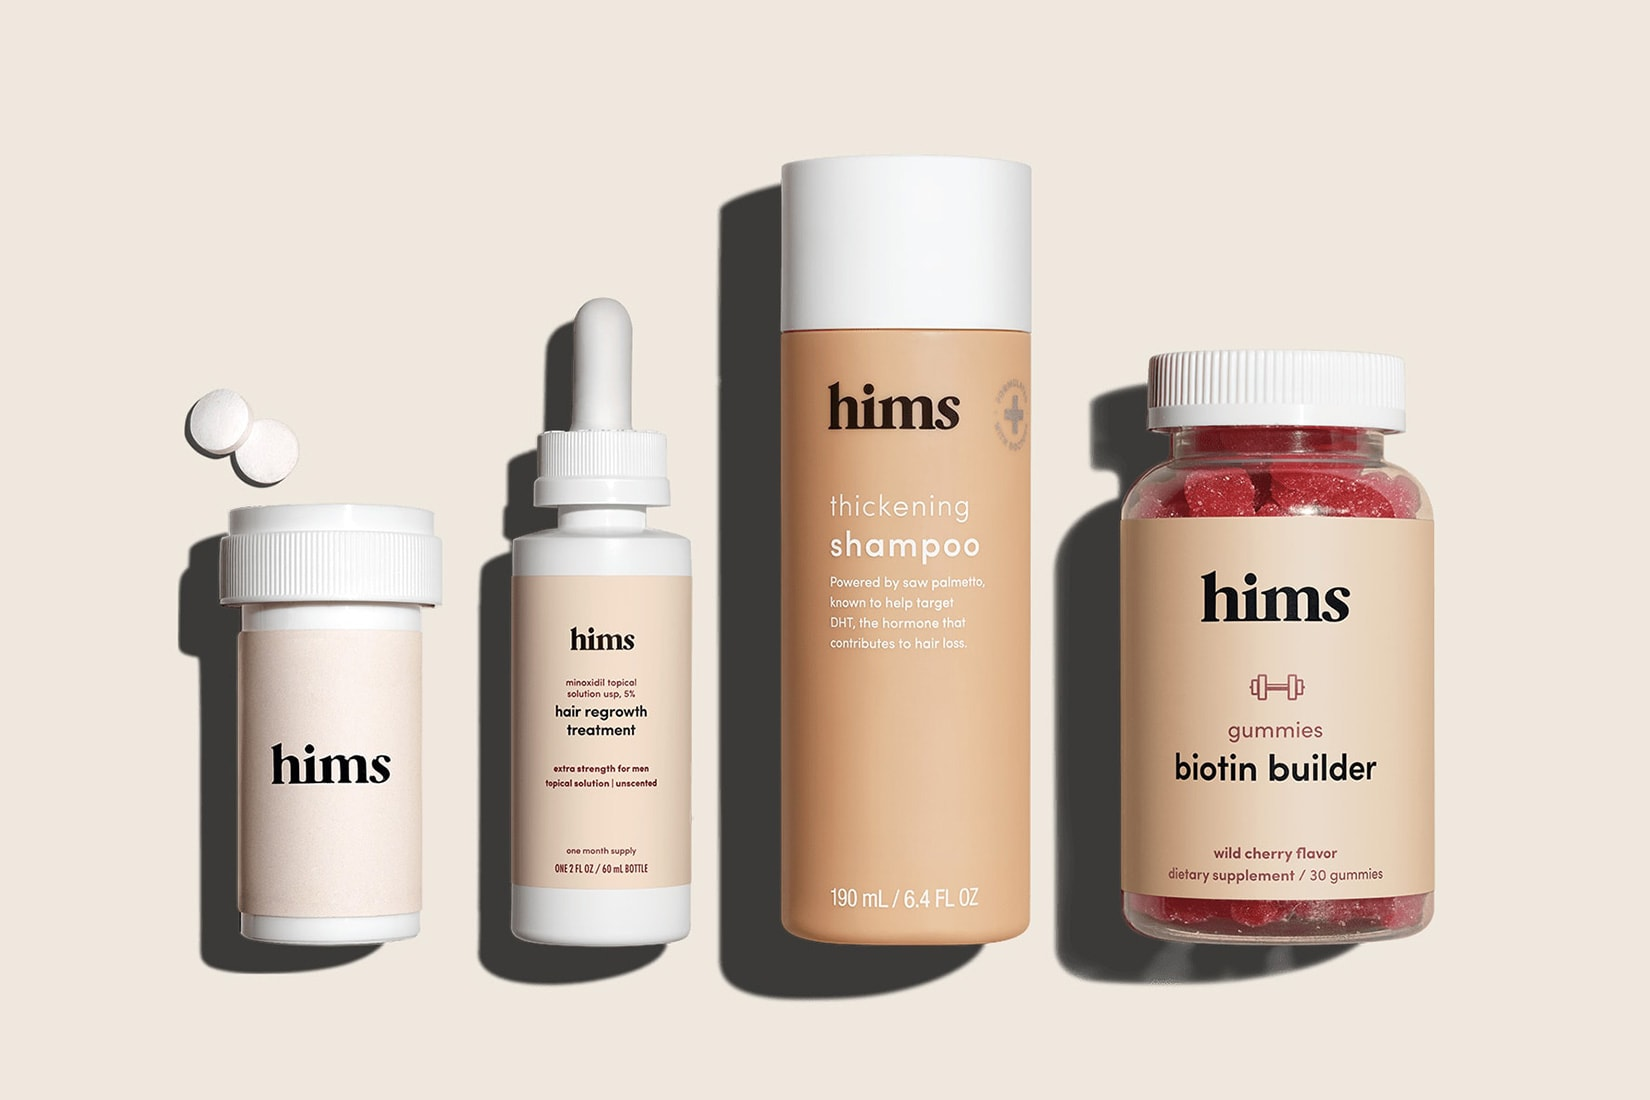 hims hair prescription customised hair power pack review - Luxe Digital